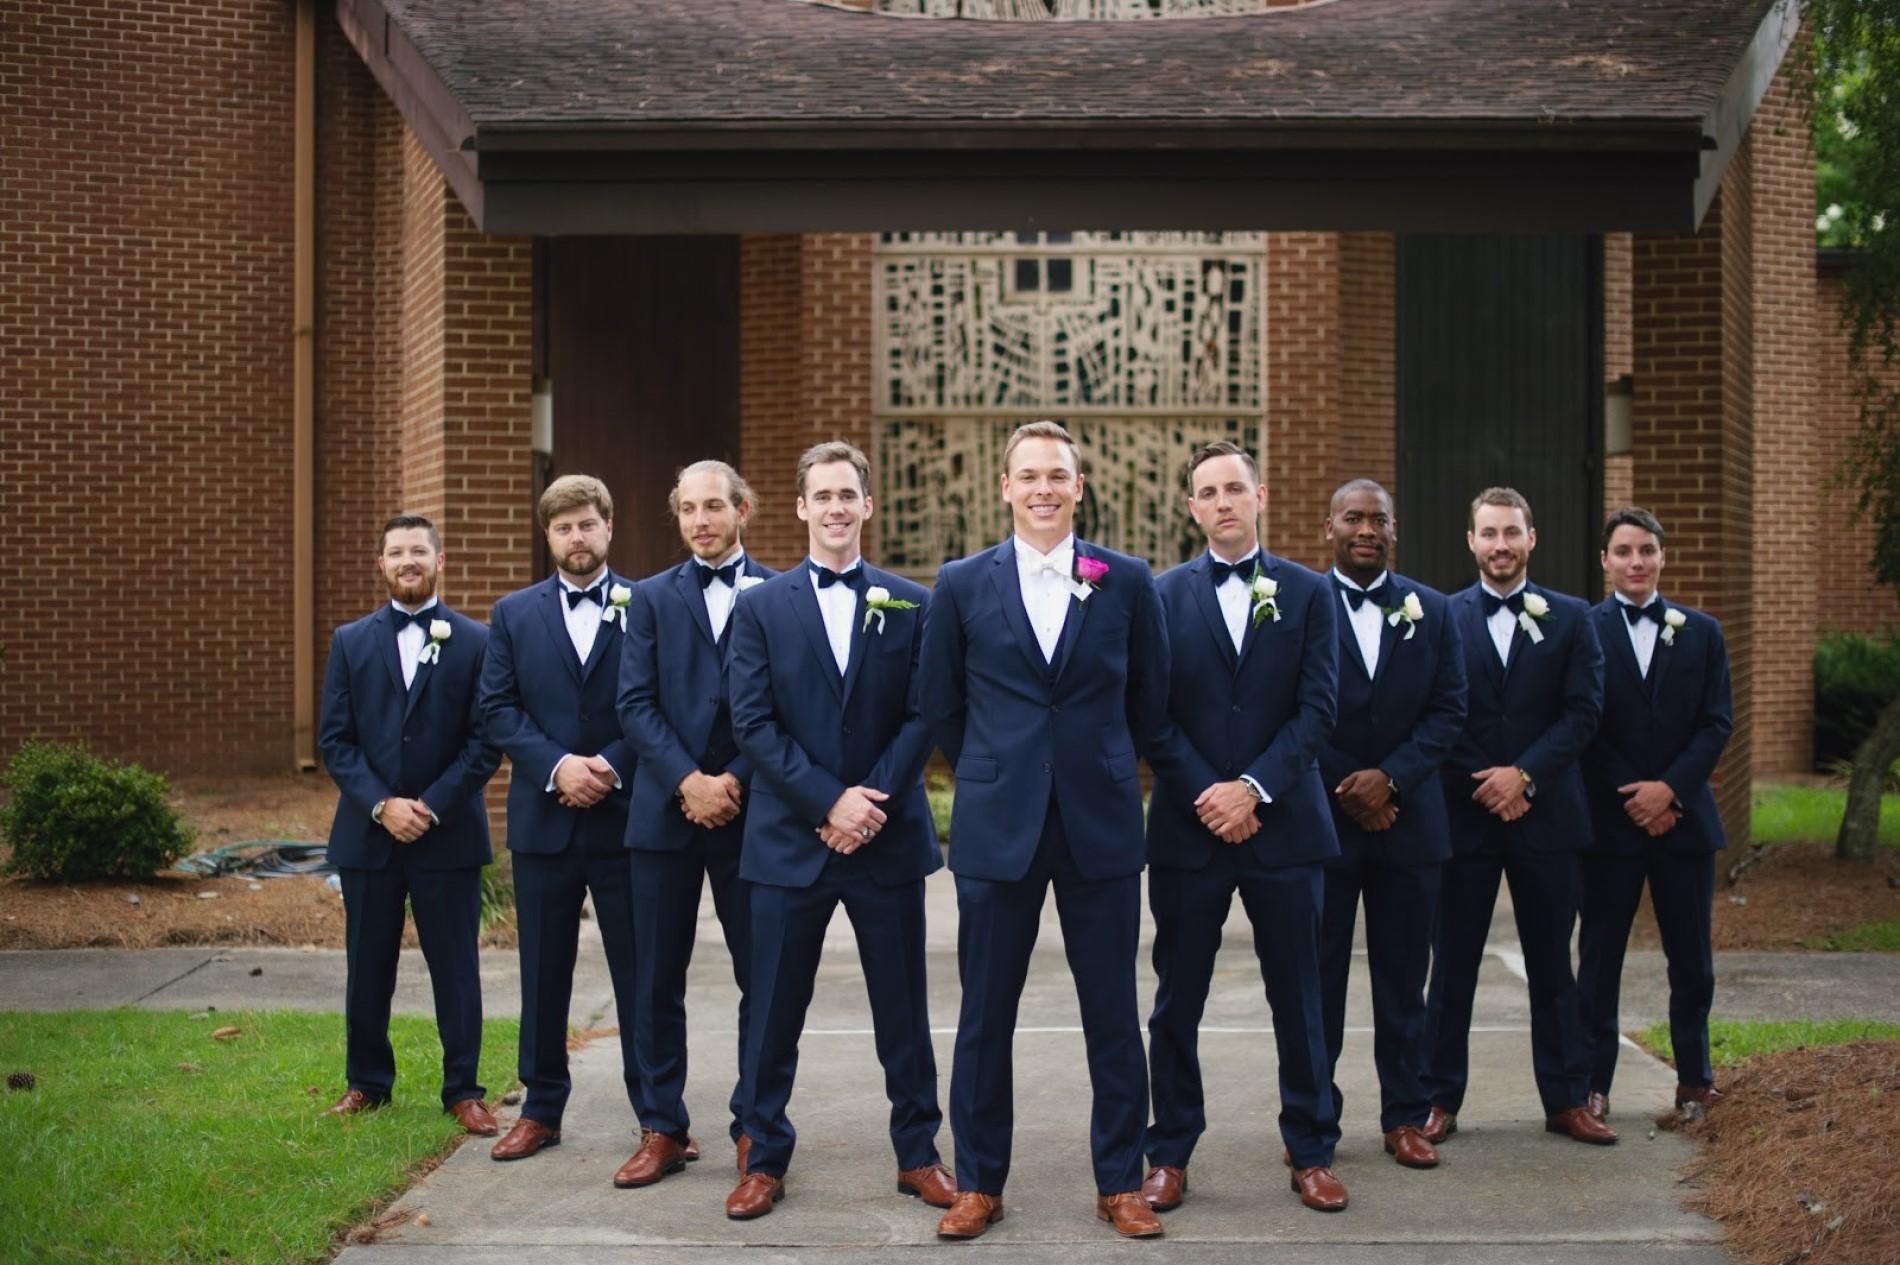 Men's Wedding Group | Simon's Formal Wear Augusta, GA | Suits - Tuxedos - Men's Formal Wear